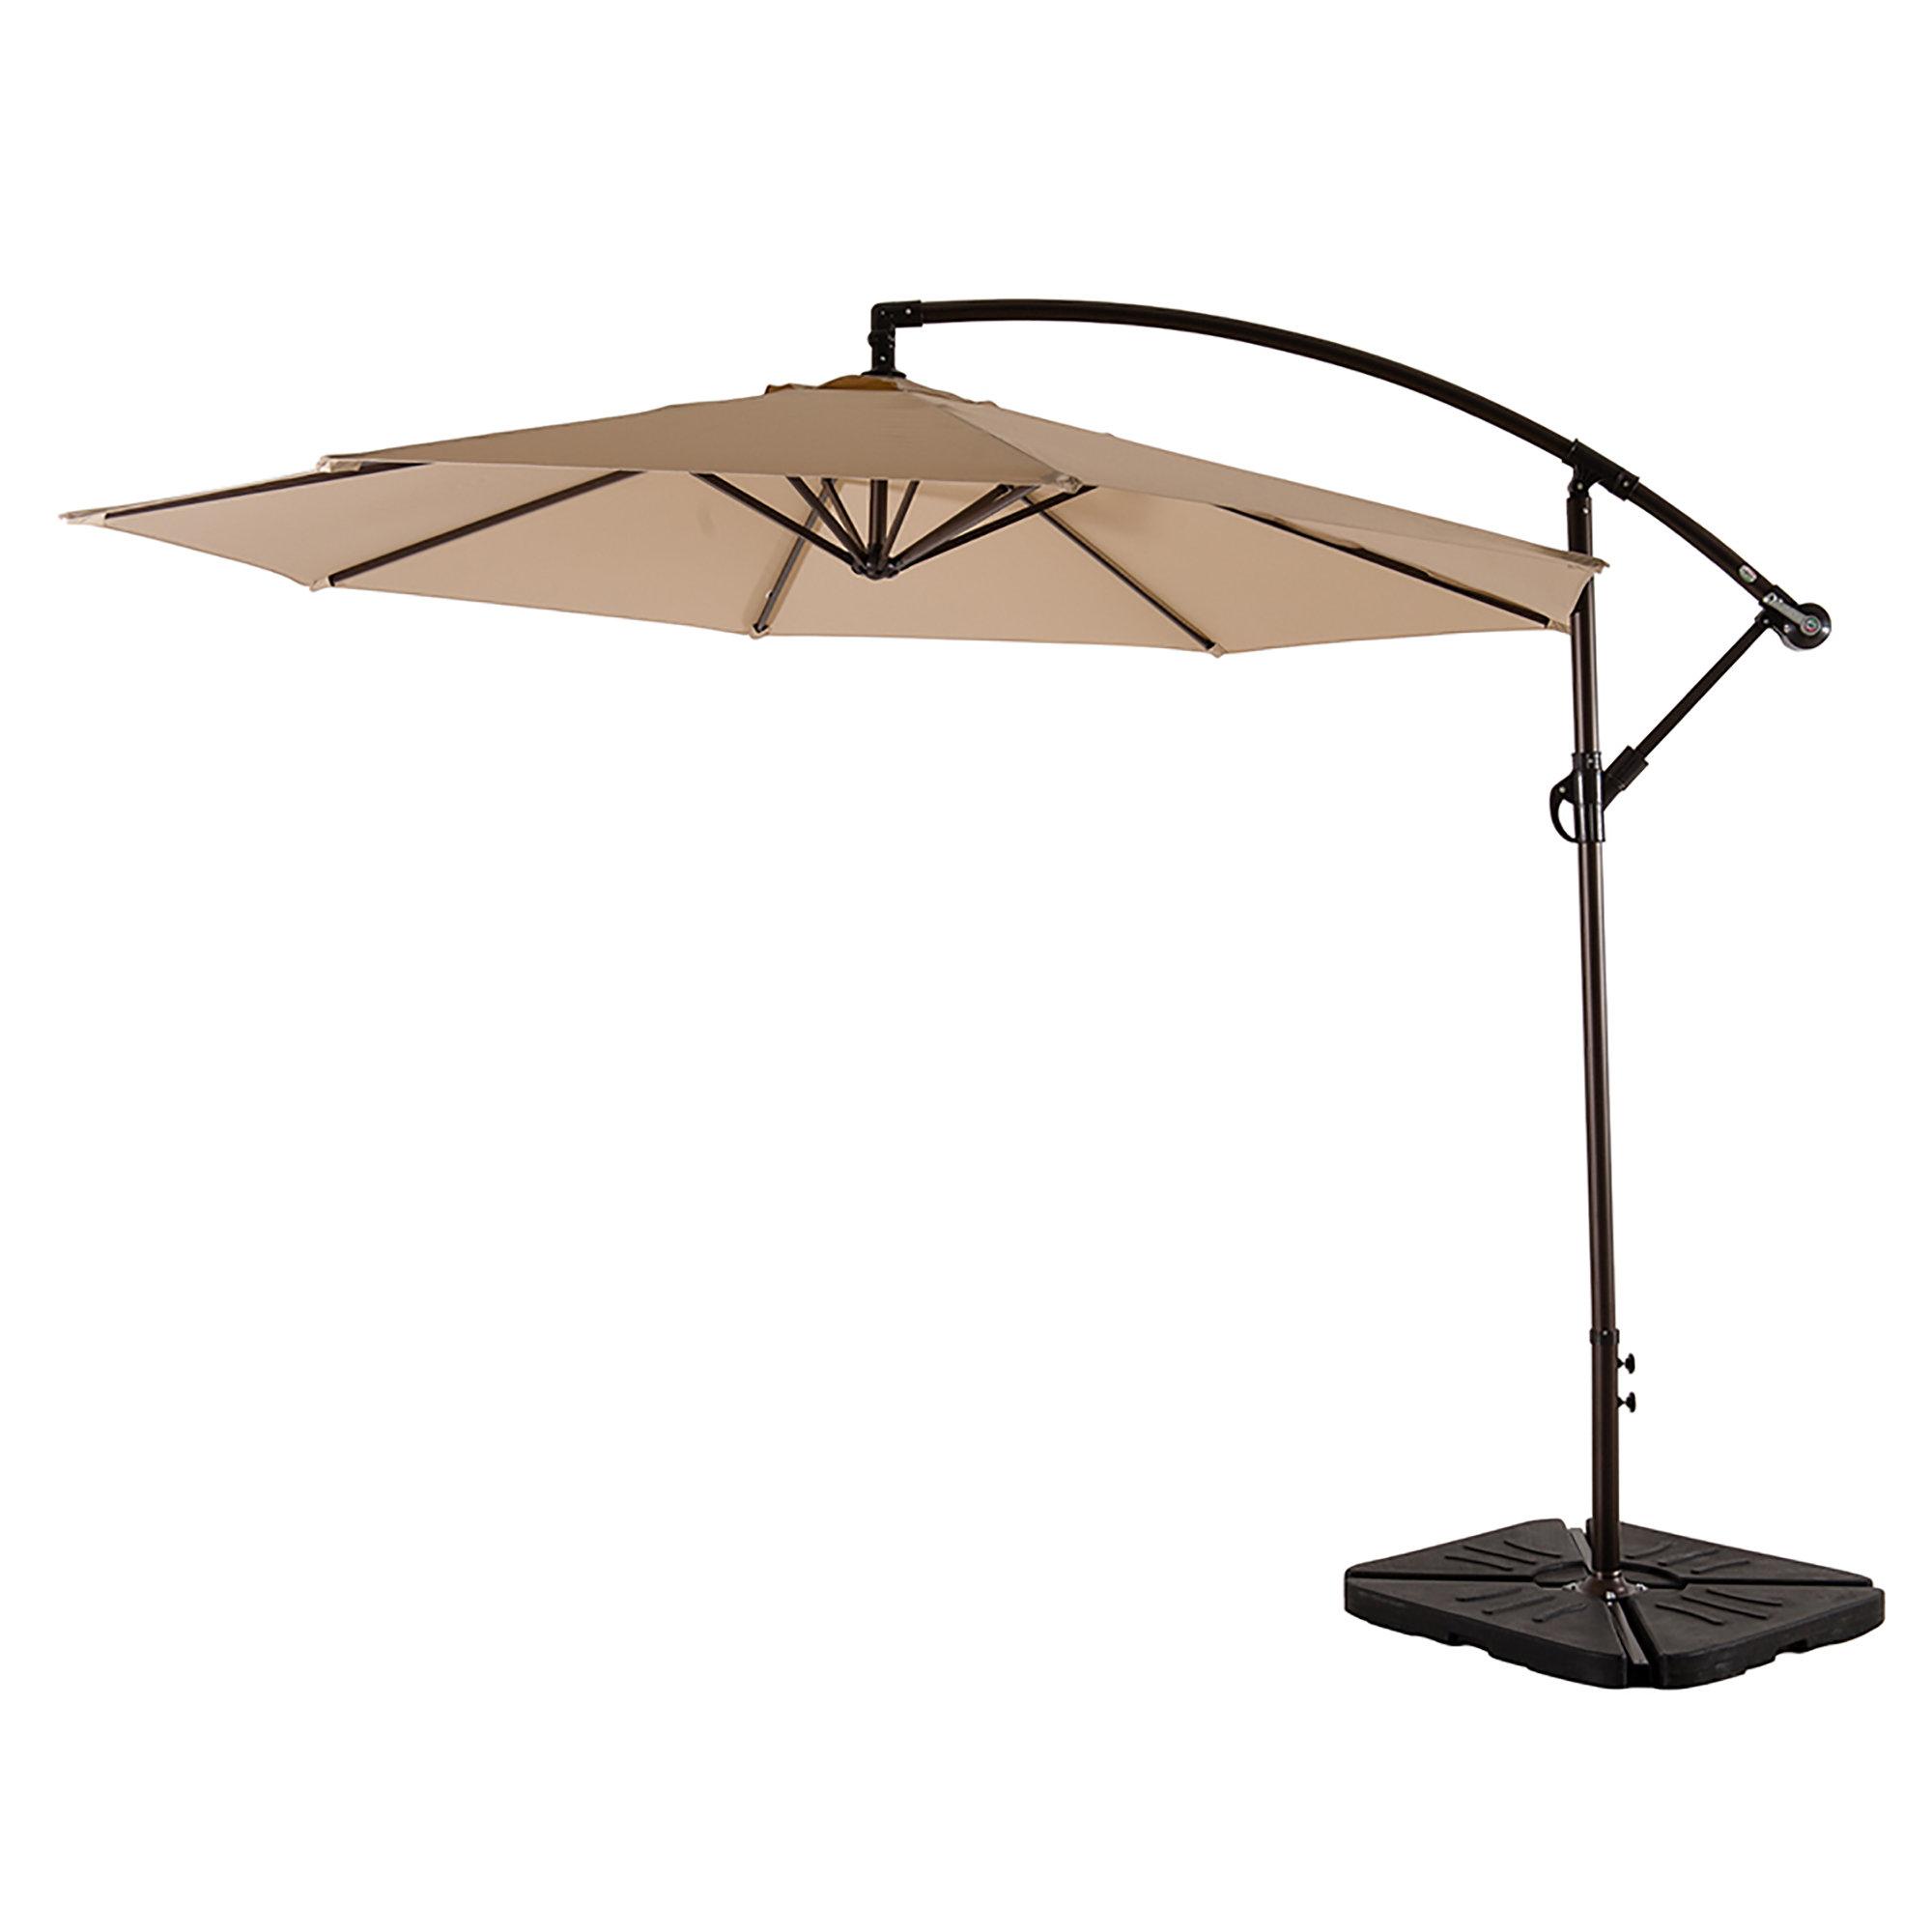 Kizzie Market 10' Cantilever Umbrella Throughout Favorite Kizzie Market Cantilever Umbrellas (Gallery 1 of 20)